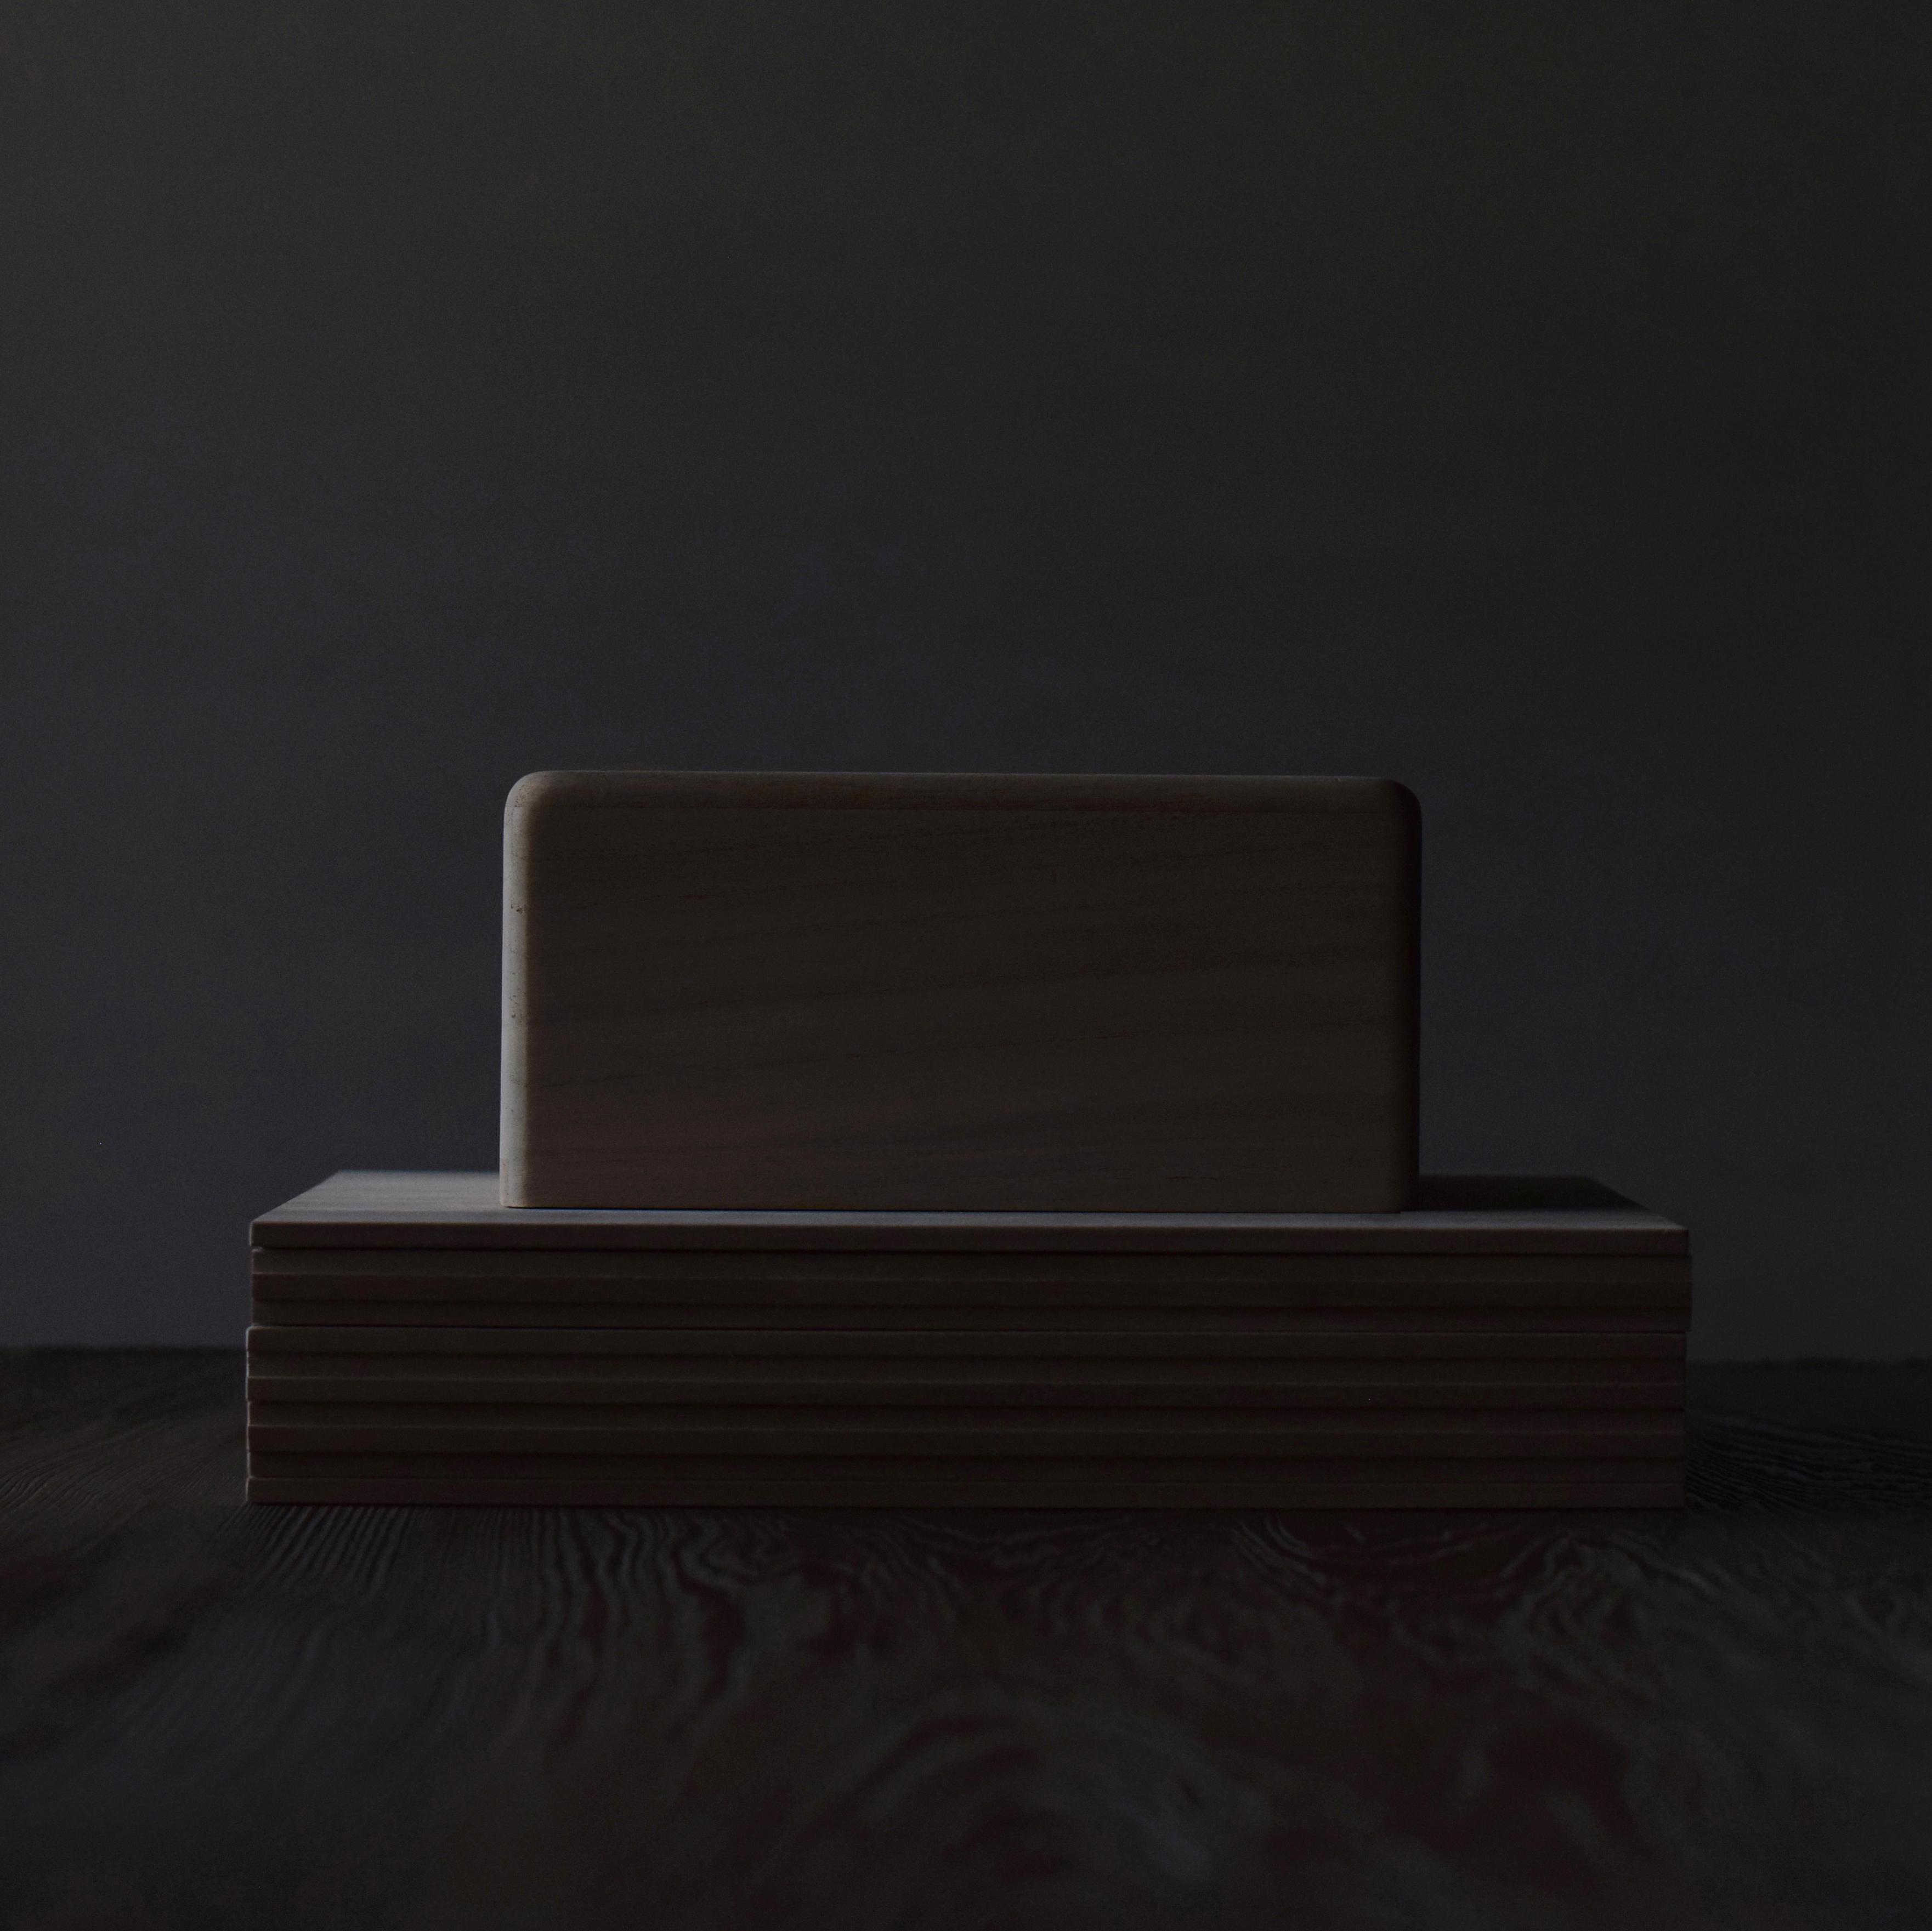 New Release: 坂本龍一の2020年の活動と記憶の断片を収めた作品『Ryuichi Sakamoto | 2020S』